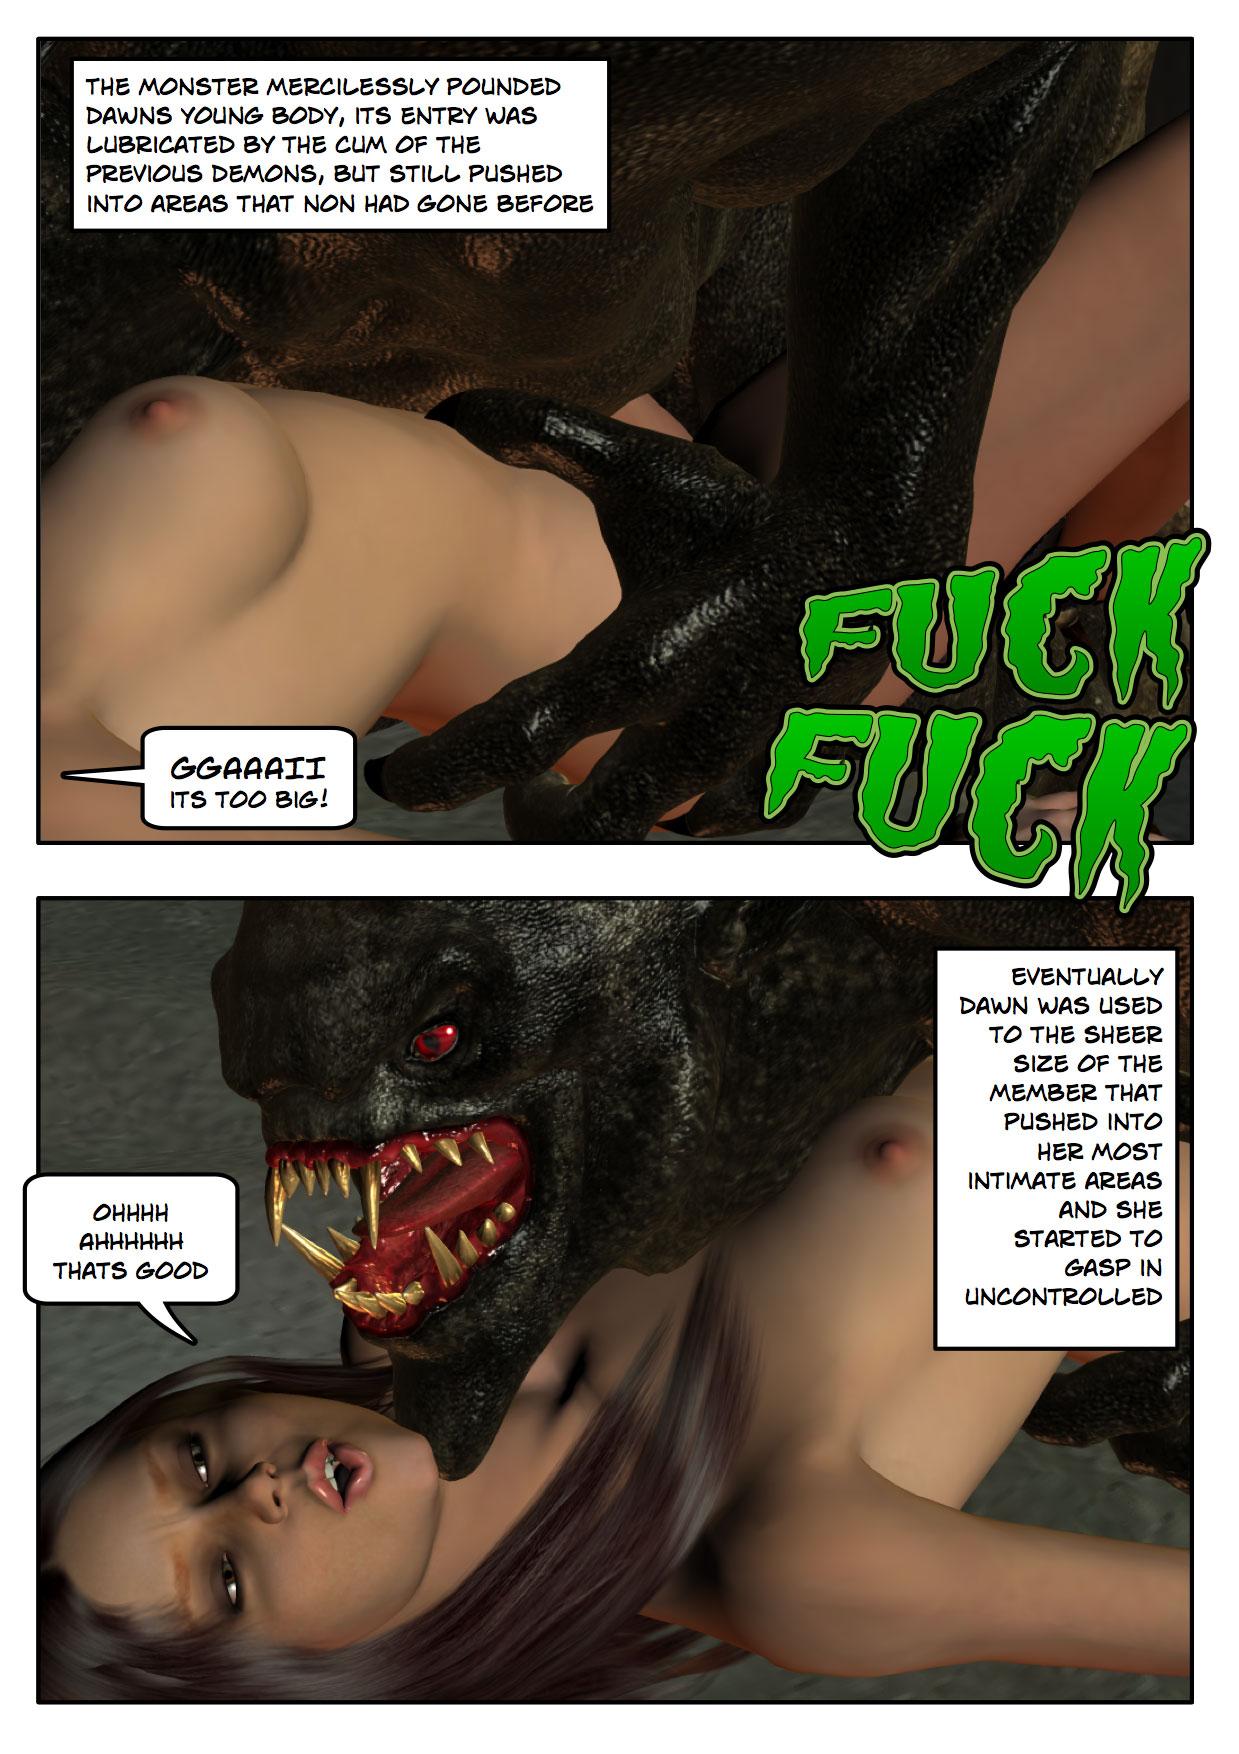 3d beast sex galerie nsfw scene